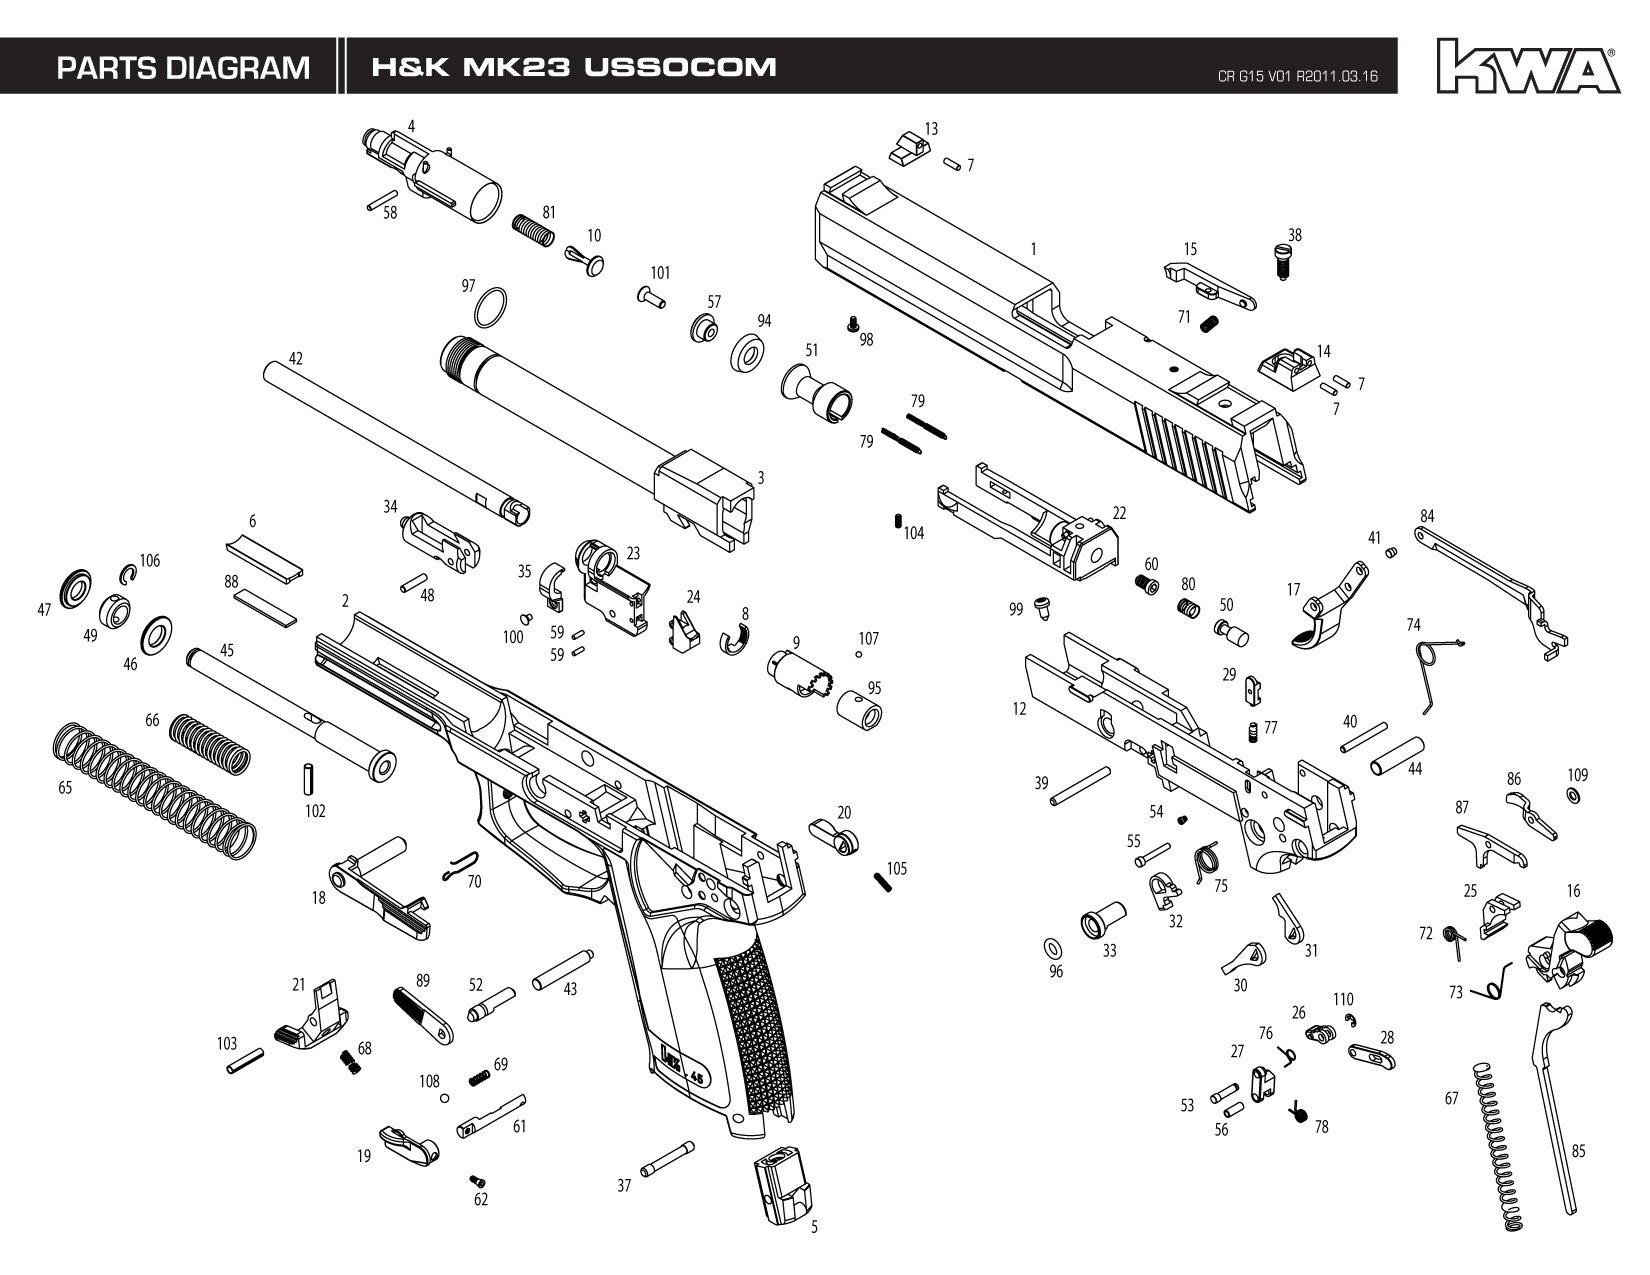 Kwa Gun Manual H Amp K Mk23